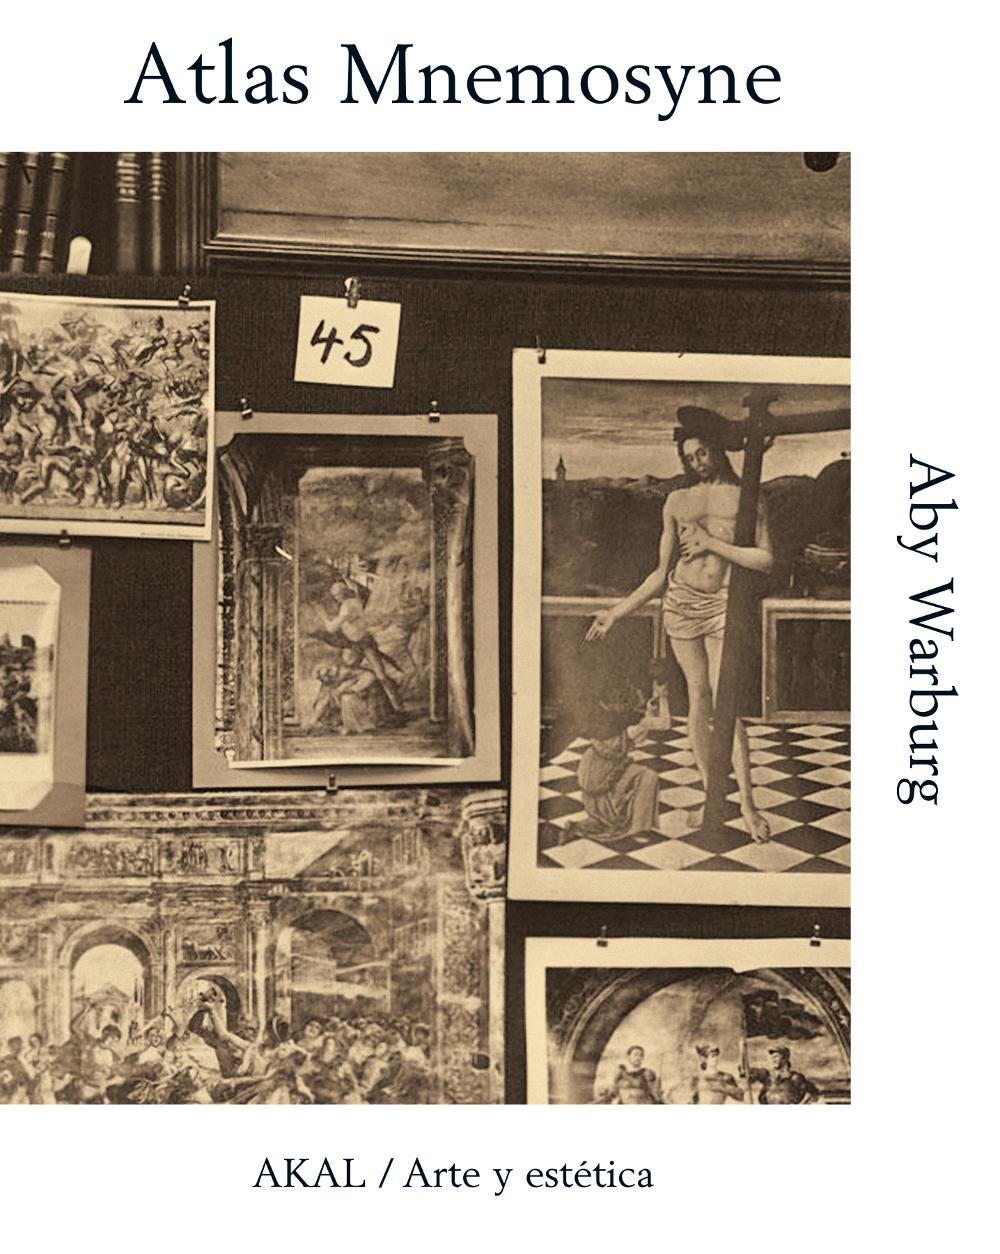 atlas mnemosyne-aby warburg-9788446028253